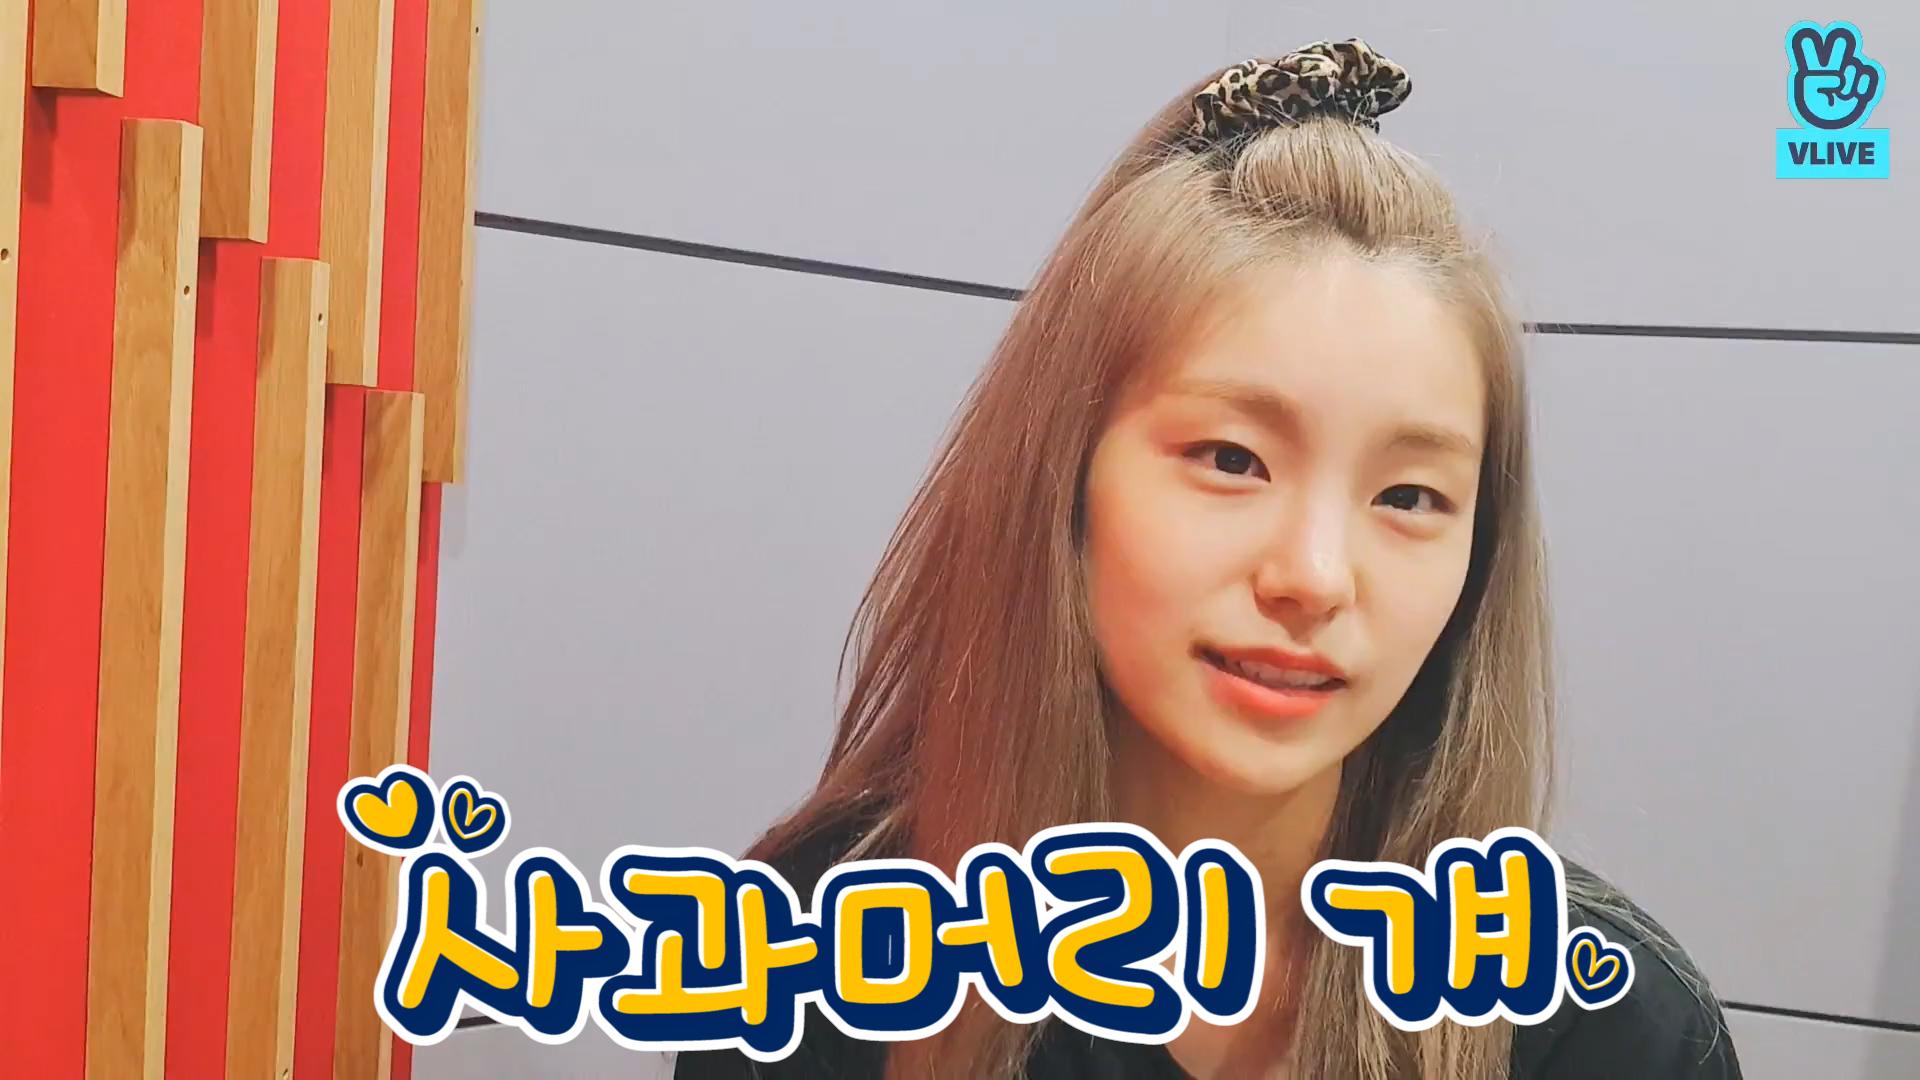 [ITZY] 교환 구해요‼️ 저: 브이픽 / 님: 레드와인 사과머리 걔 기억공유🍎 (YEJI talking about apple hair episode)